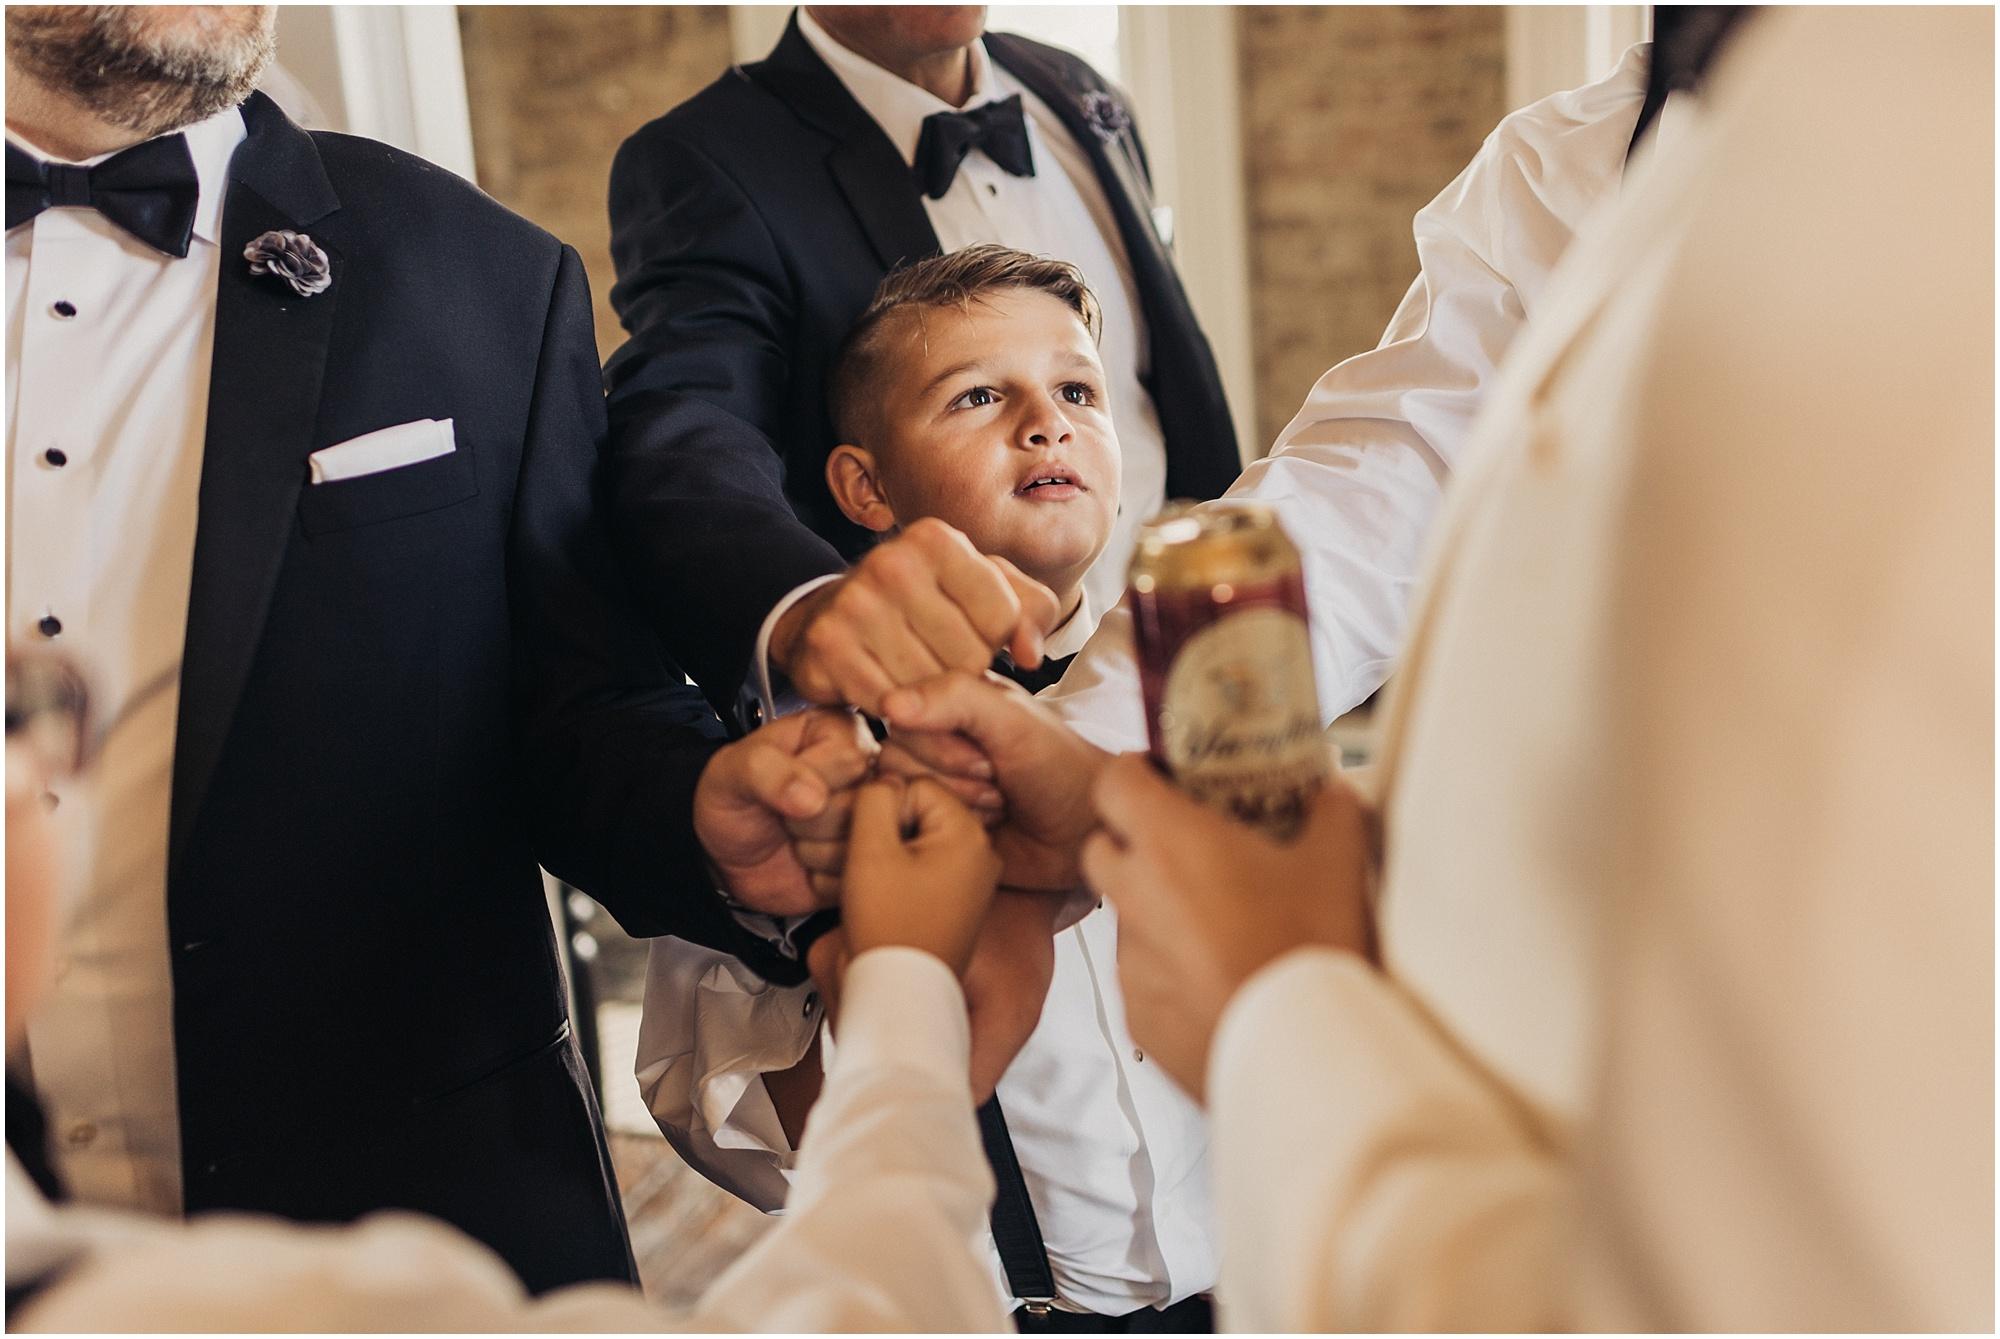 Cheers before ceremony